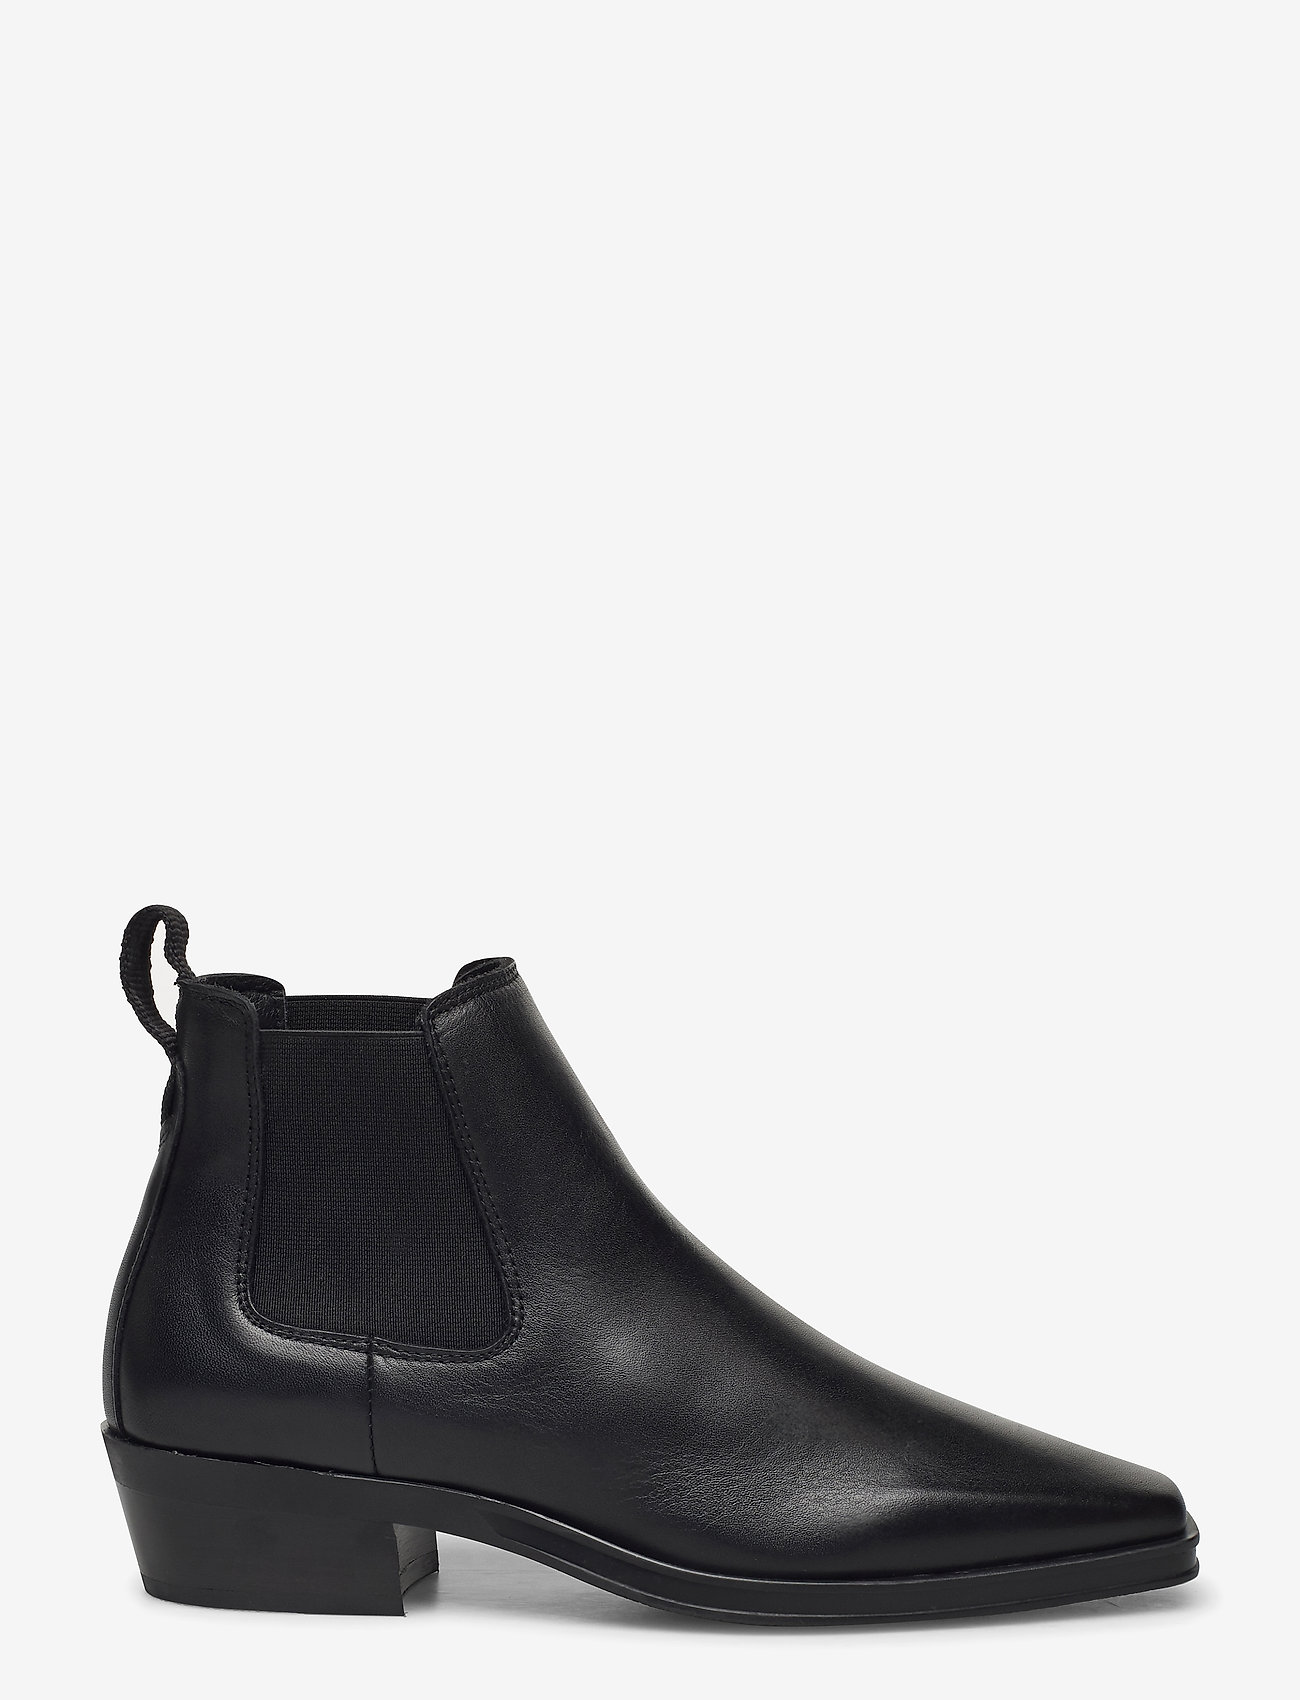 Clarks - Alcina Top - platta ankelboots - black leather - 1